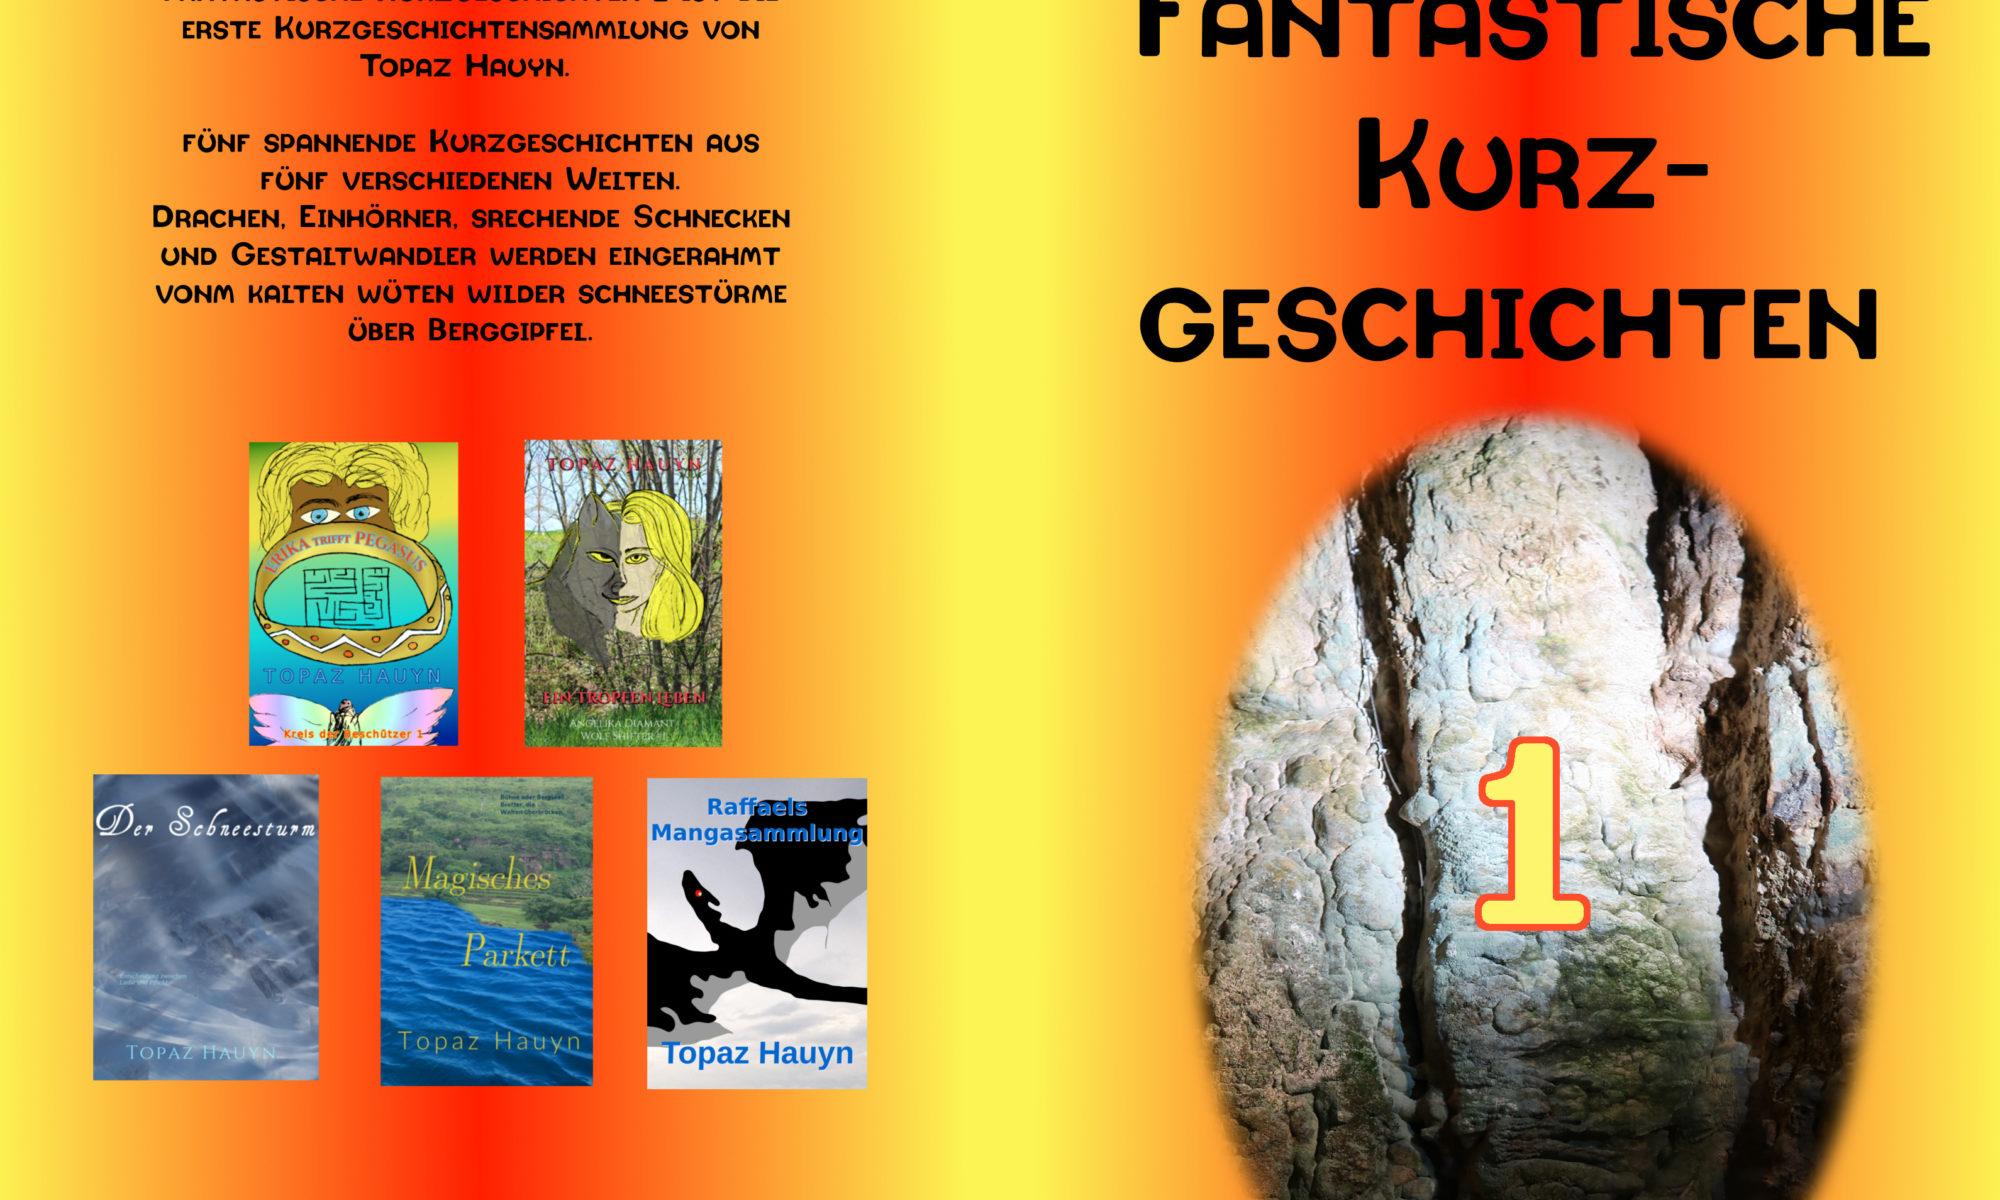 Fantastische Kurzgeschichten 1